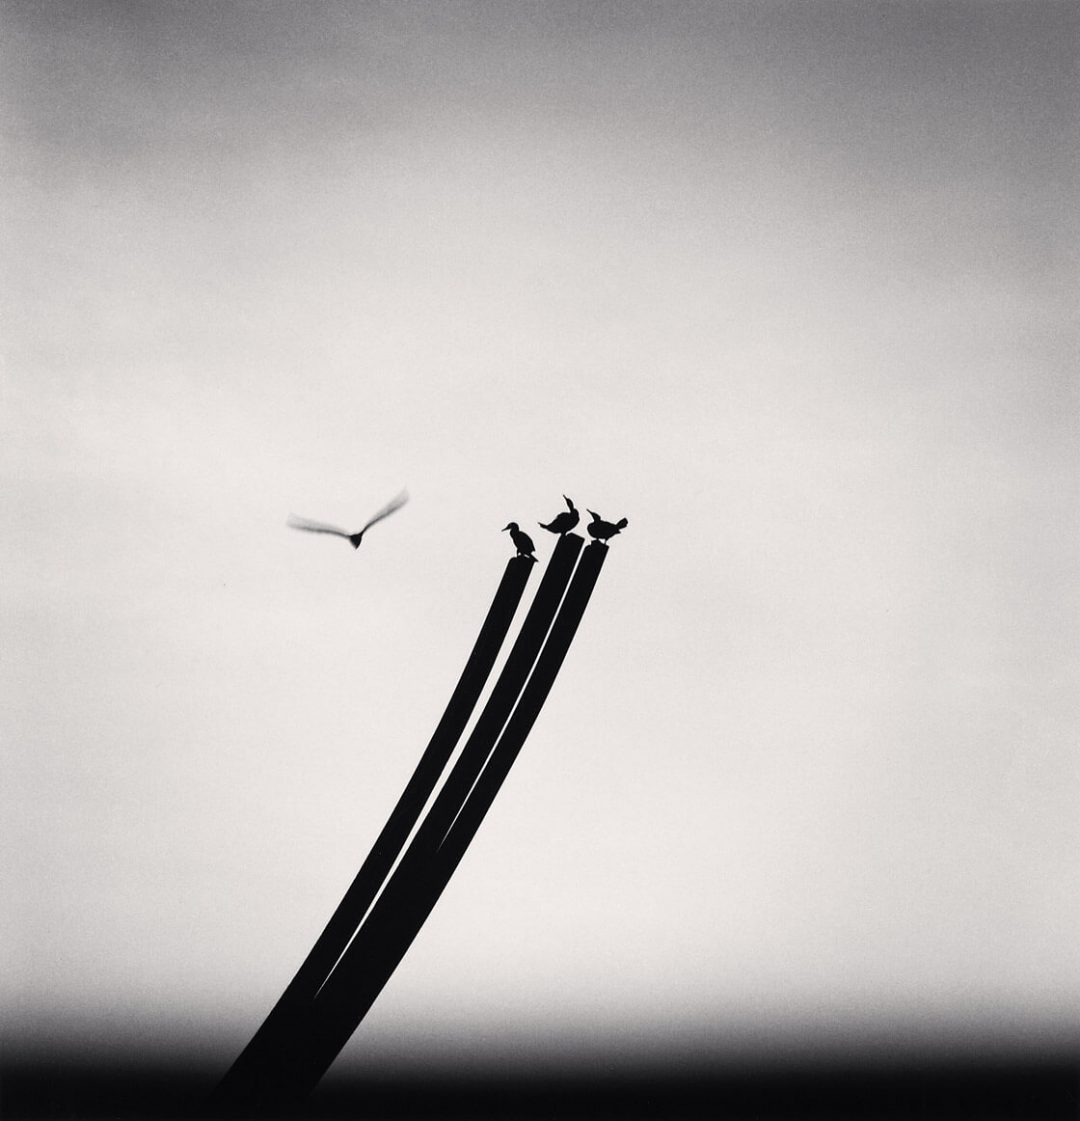 Four Birds, St. Nazaire, France - Michael Kenna